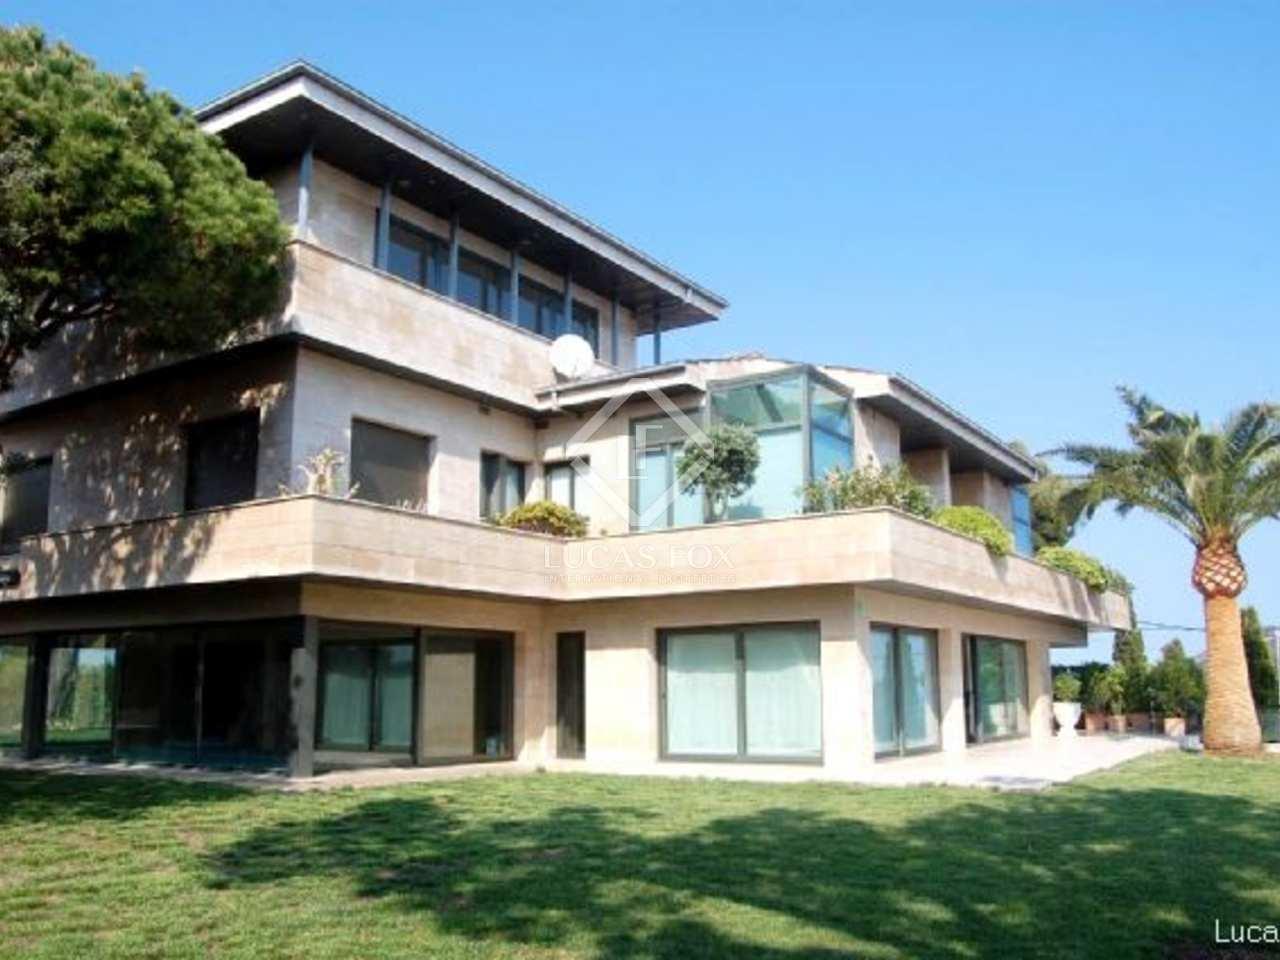 Casa de lujo en venta en castelldefels gav mar barcelona - Casas gava mar ...